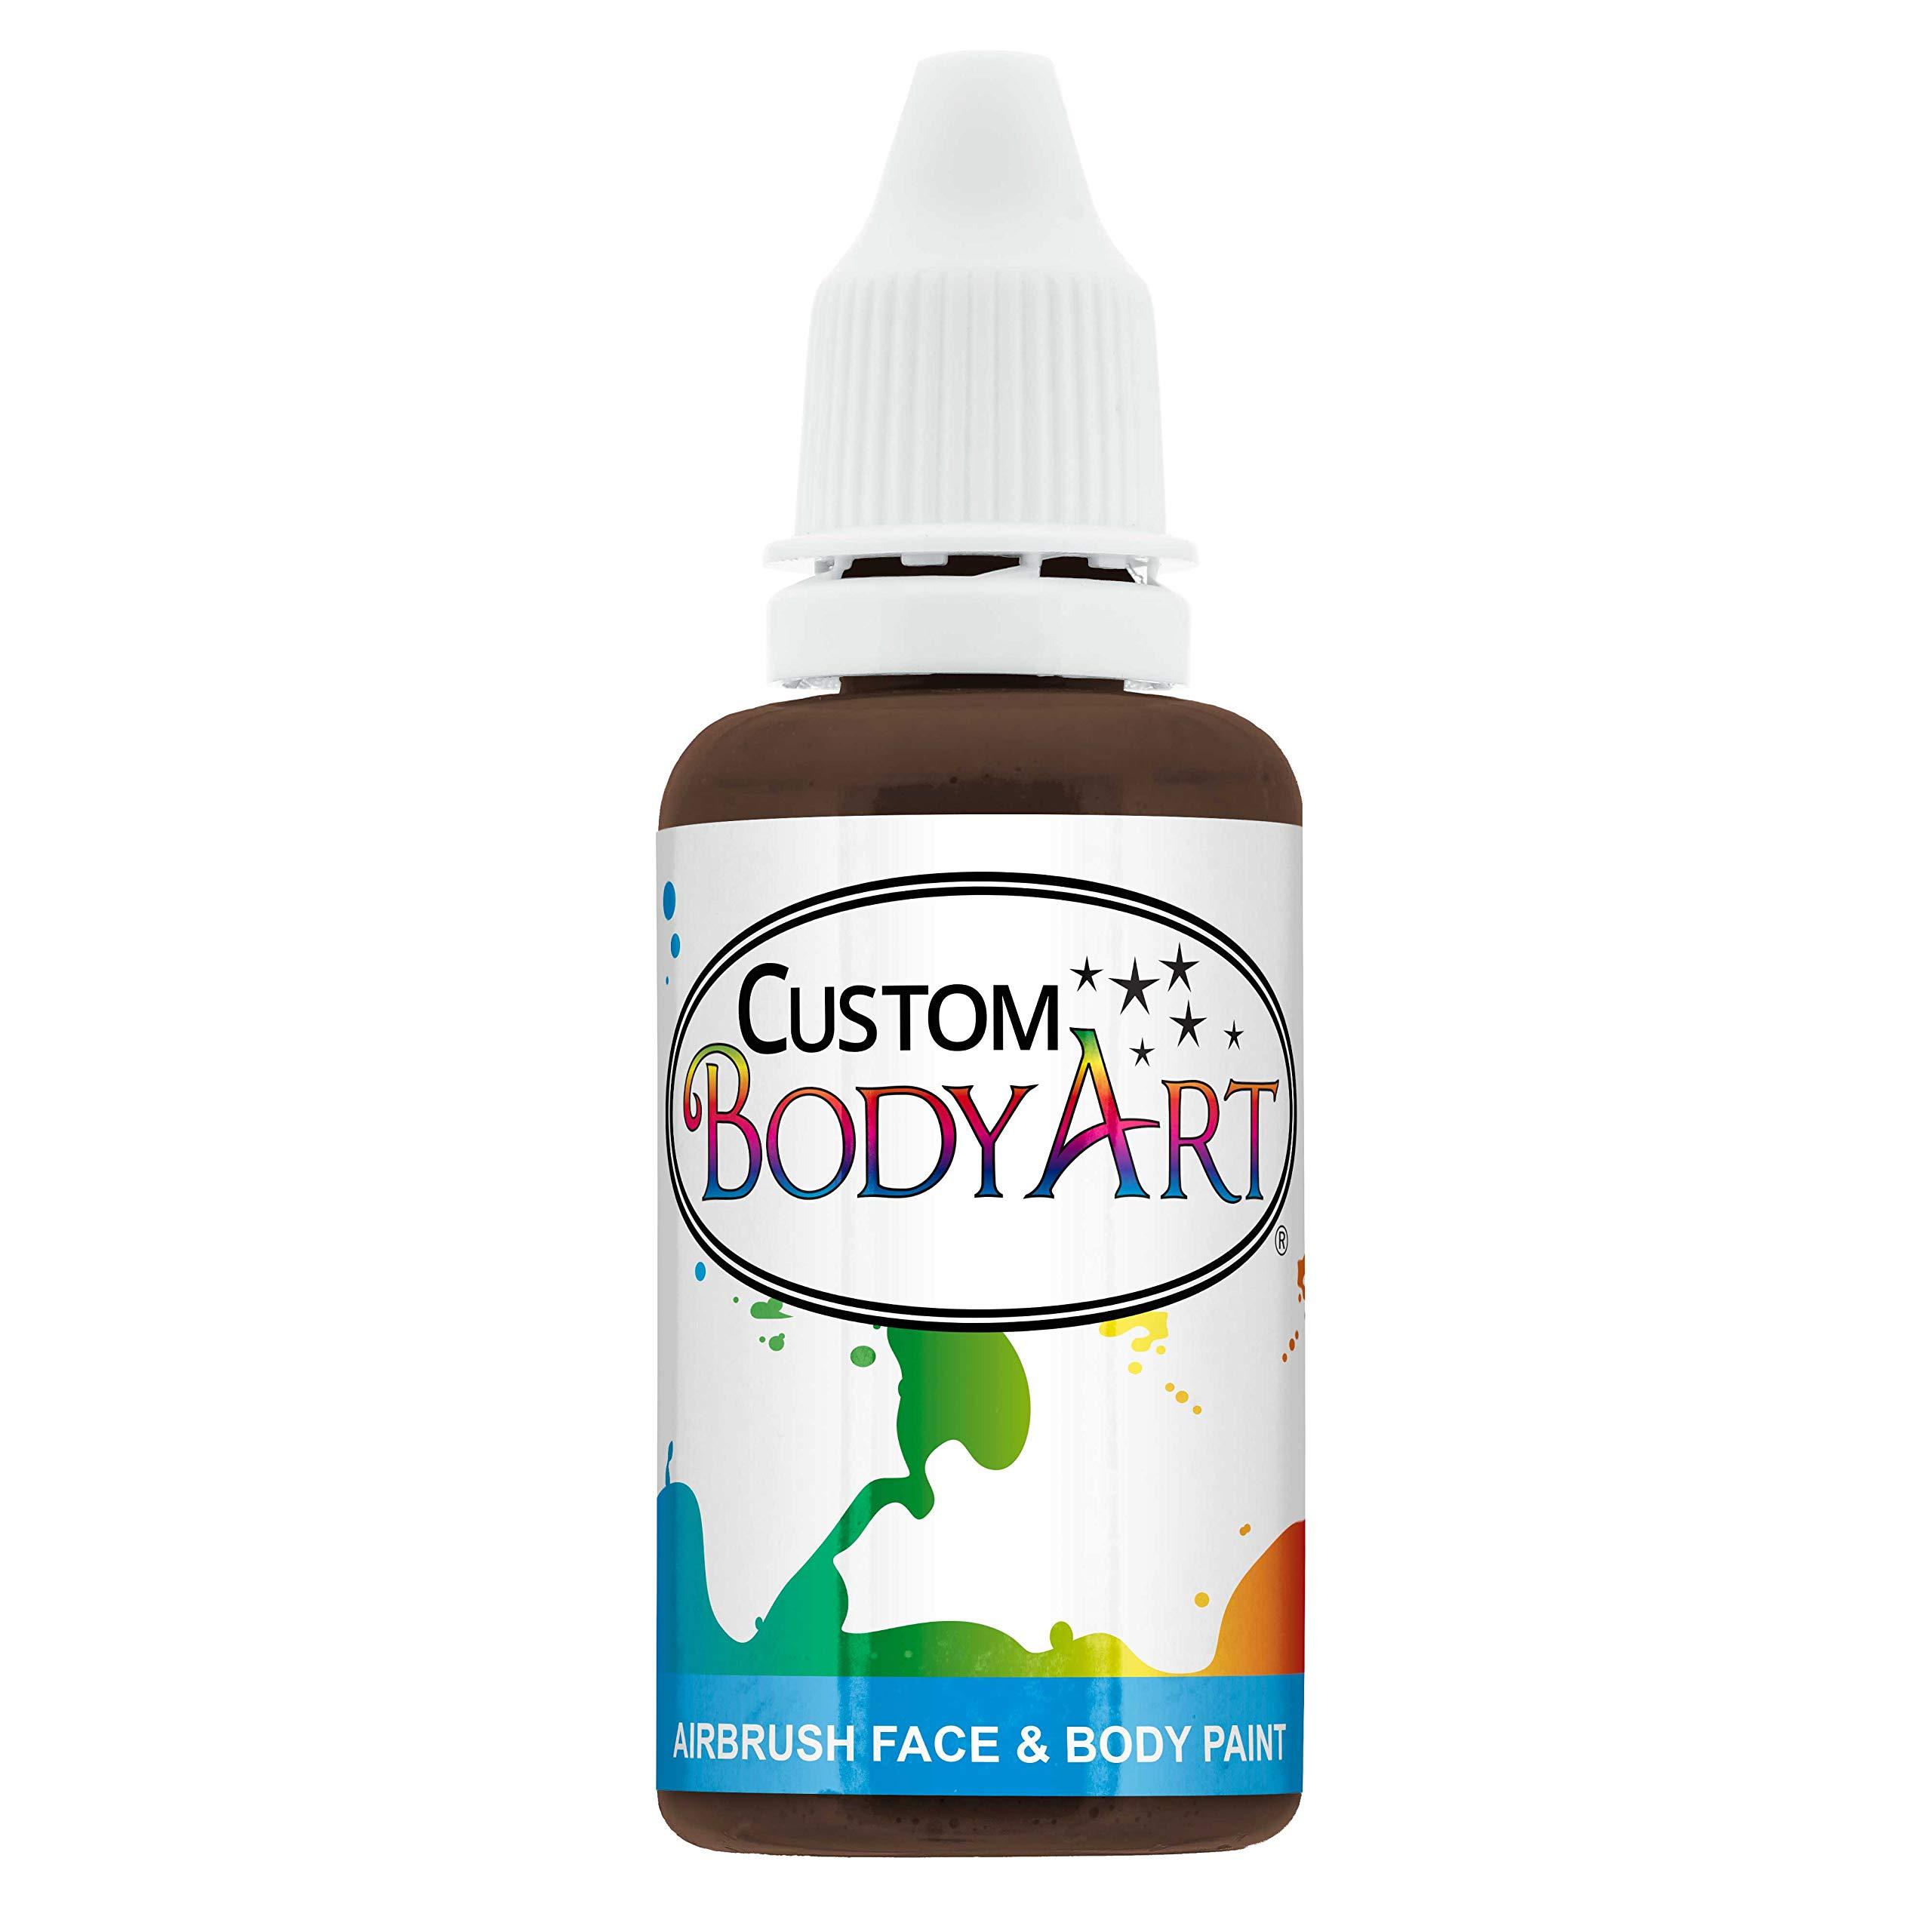 Custom Body Art 1-Ounce Brown Water Based Airbrush Body Art & Face Paint